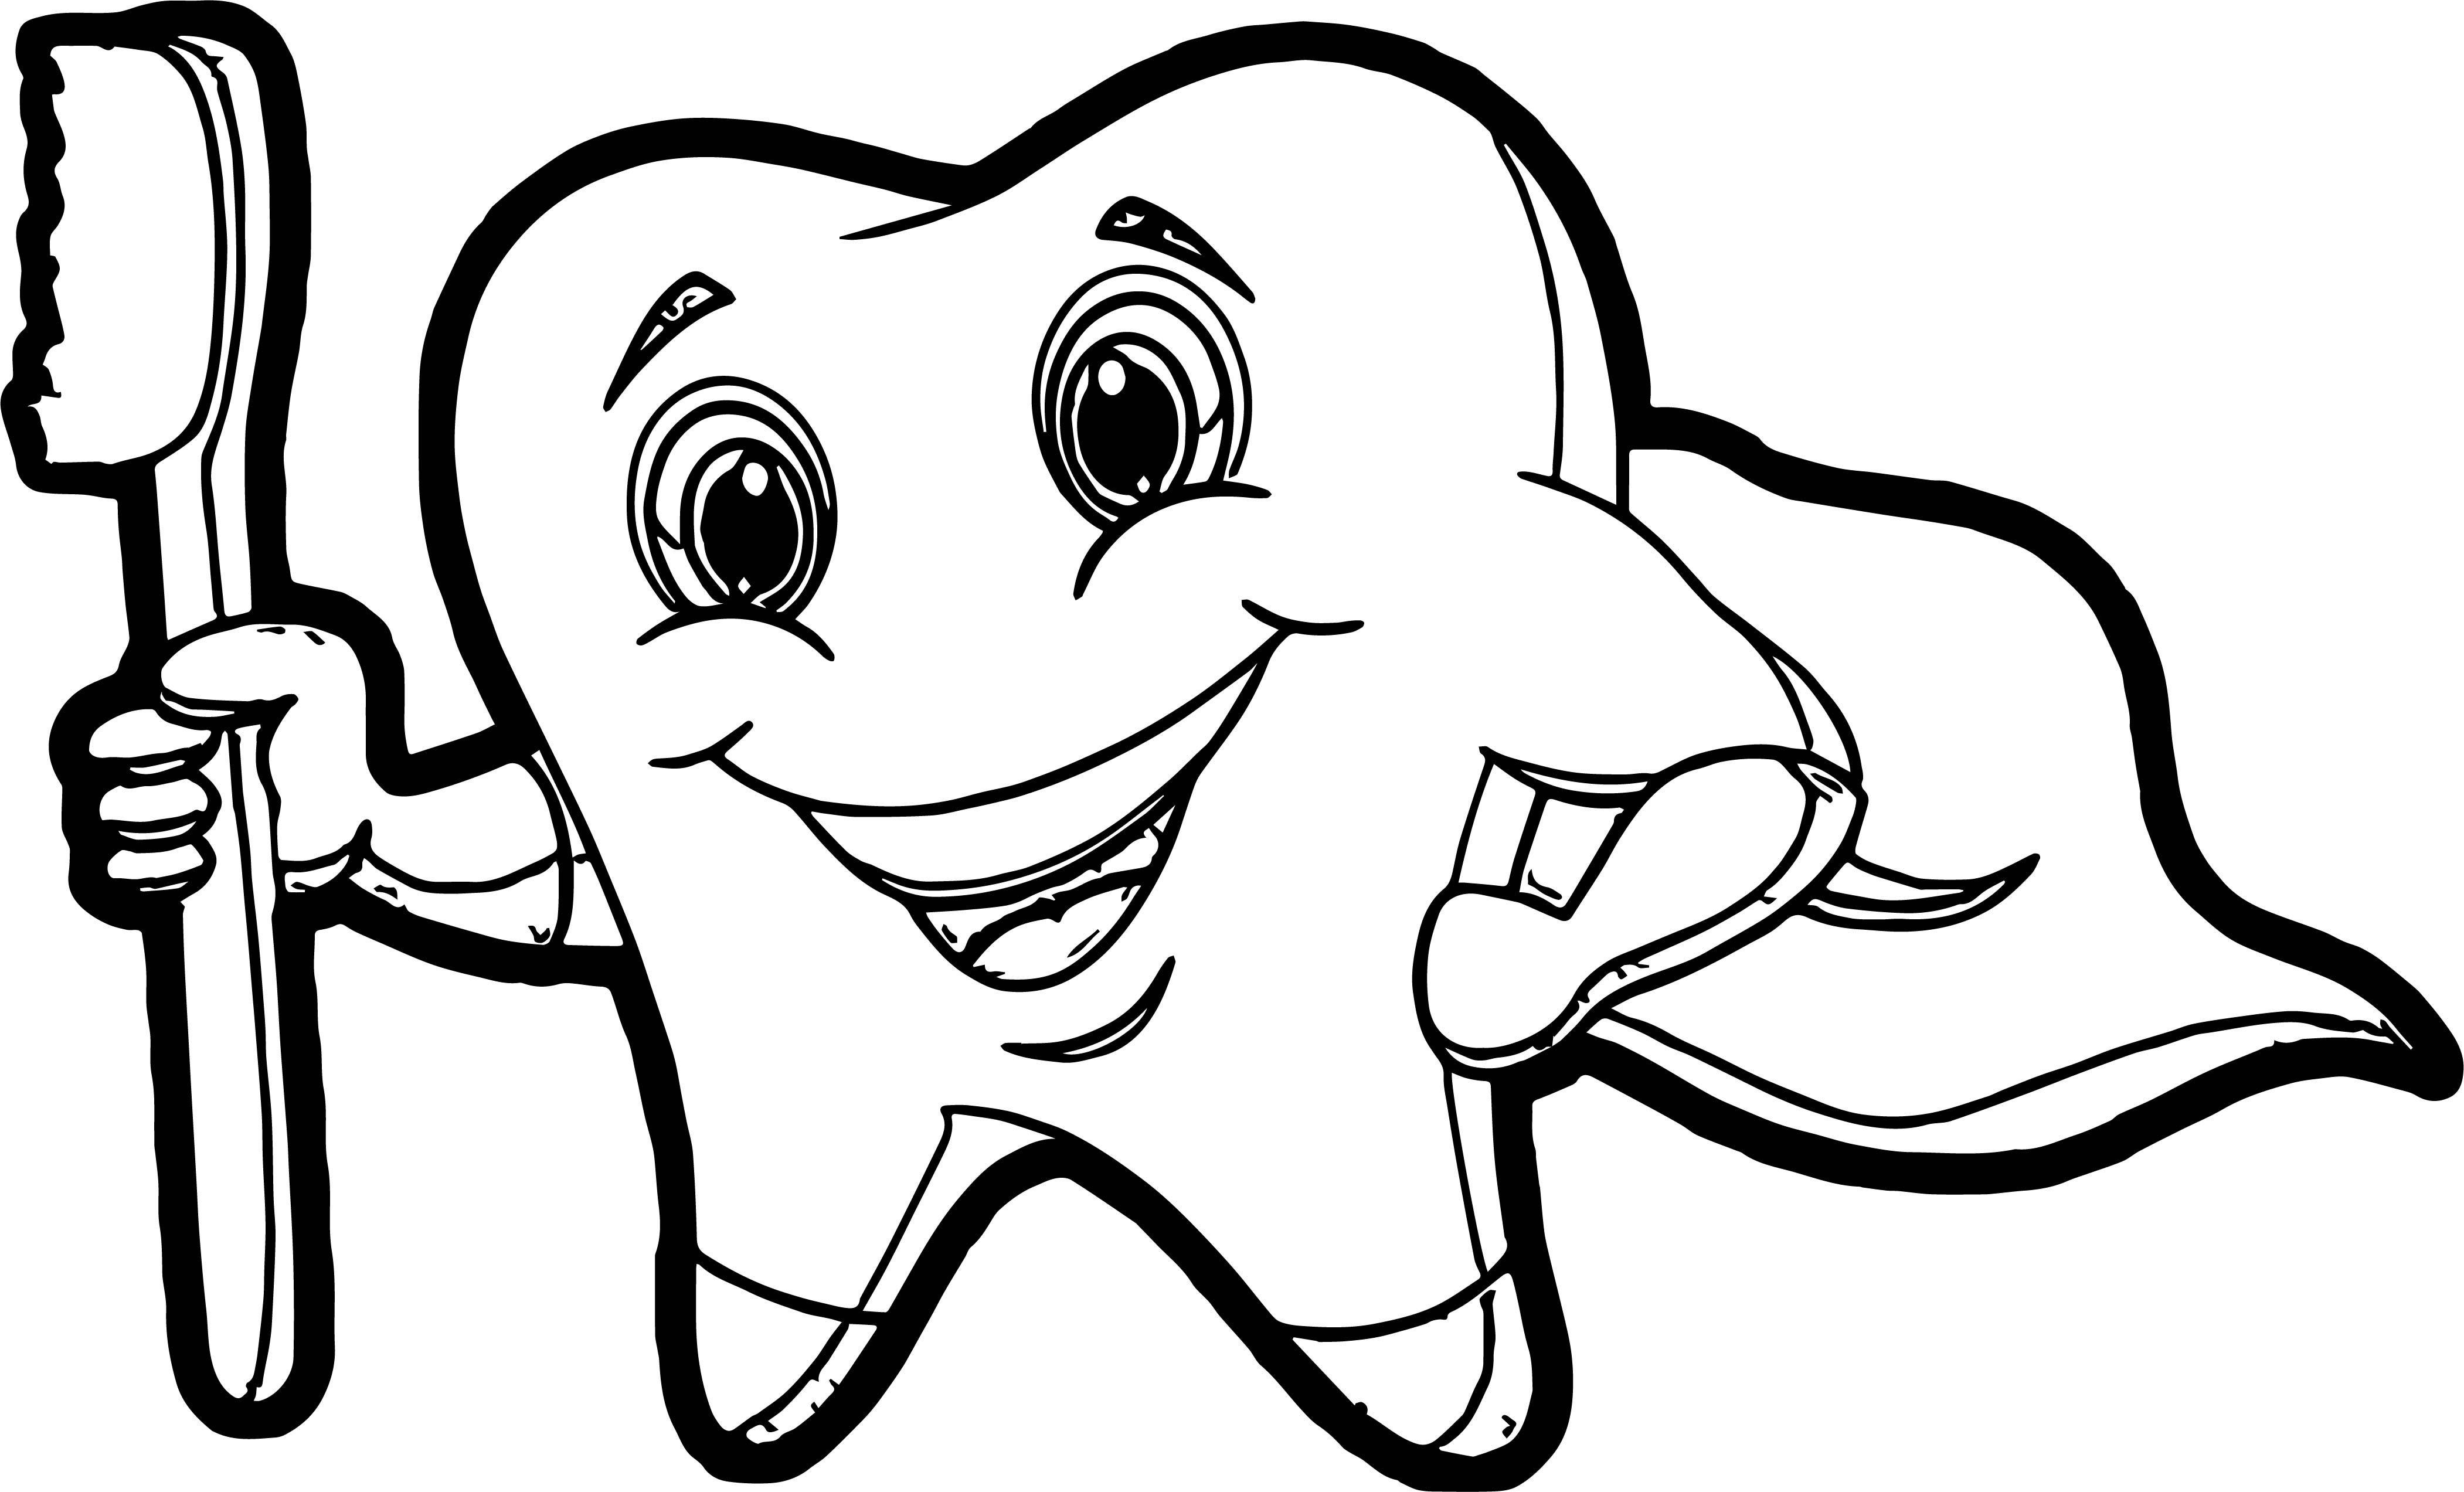 teeth coloring page # 2